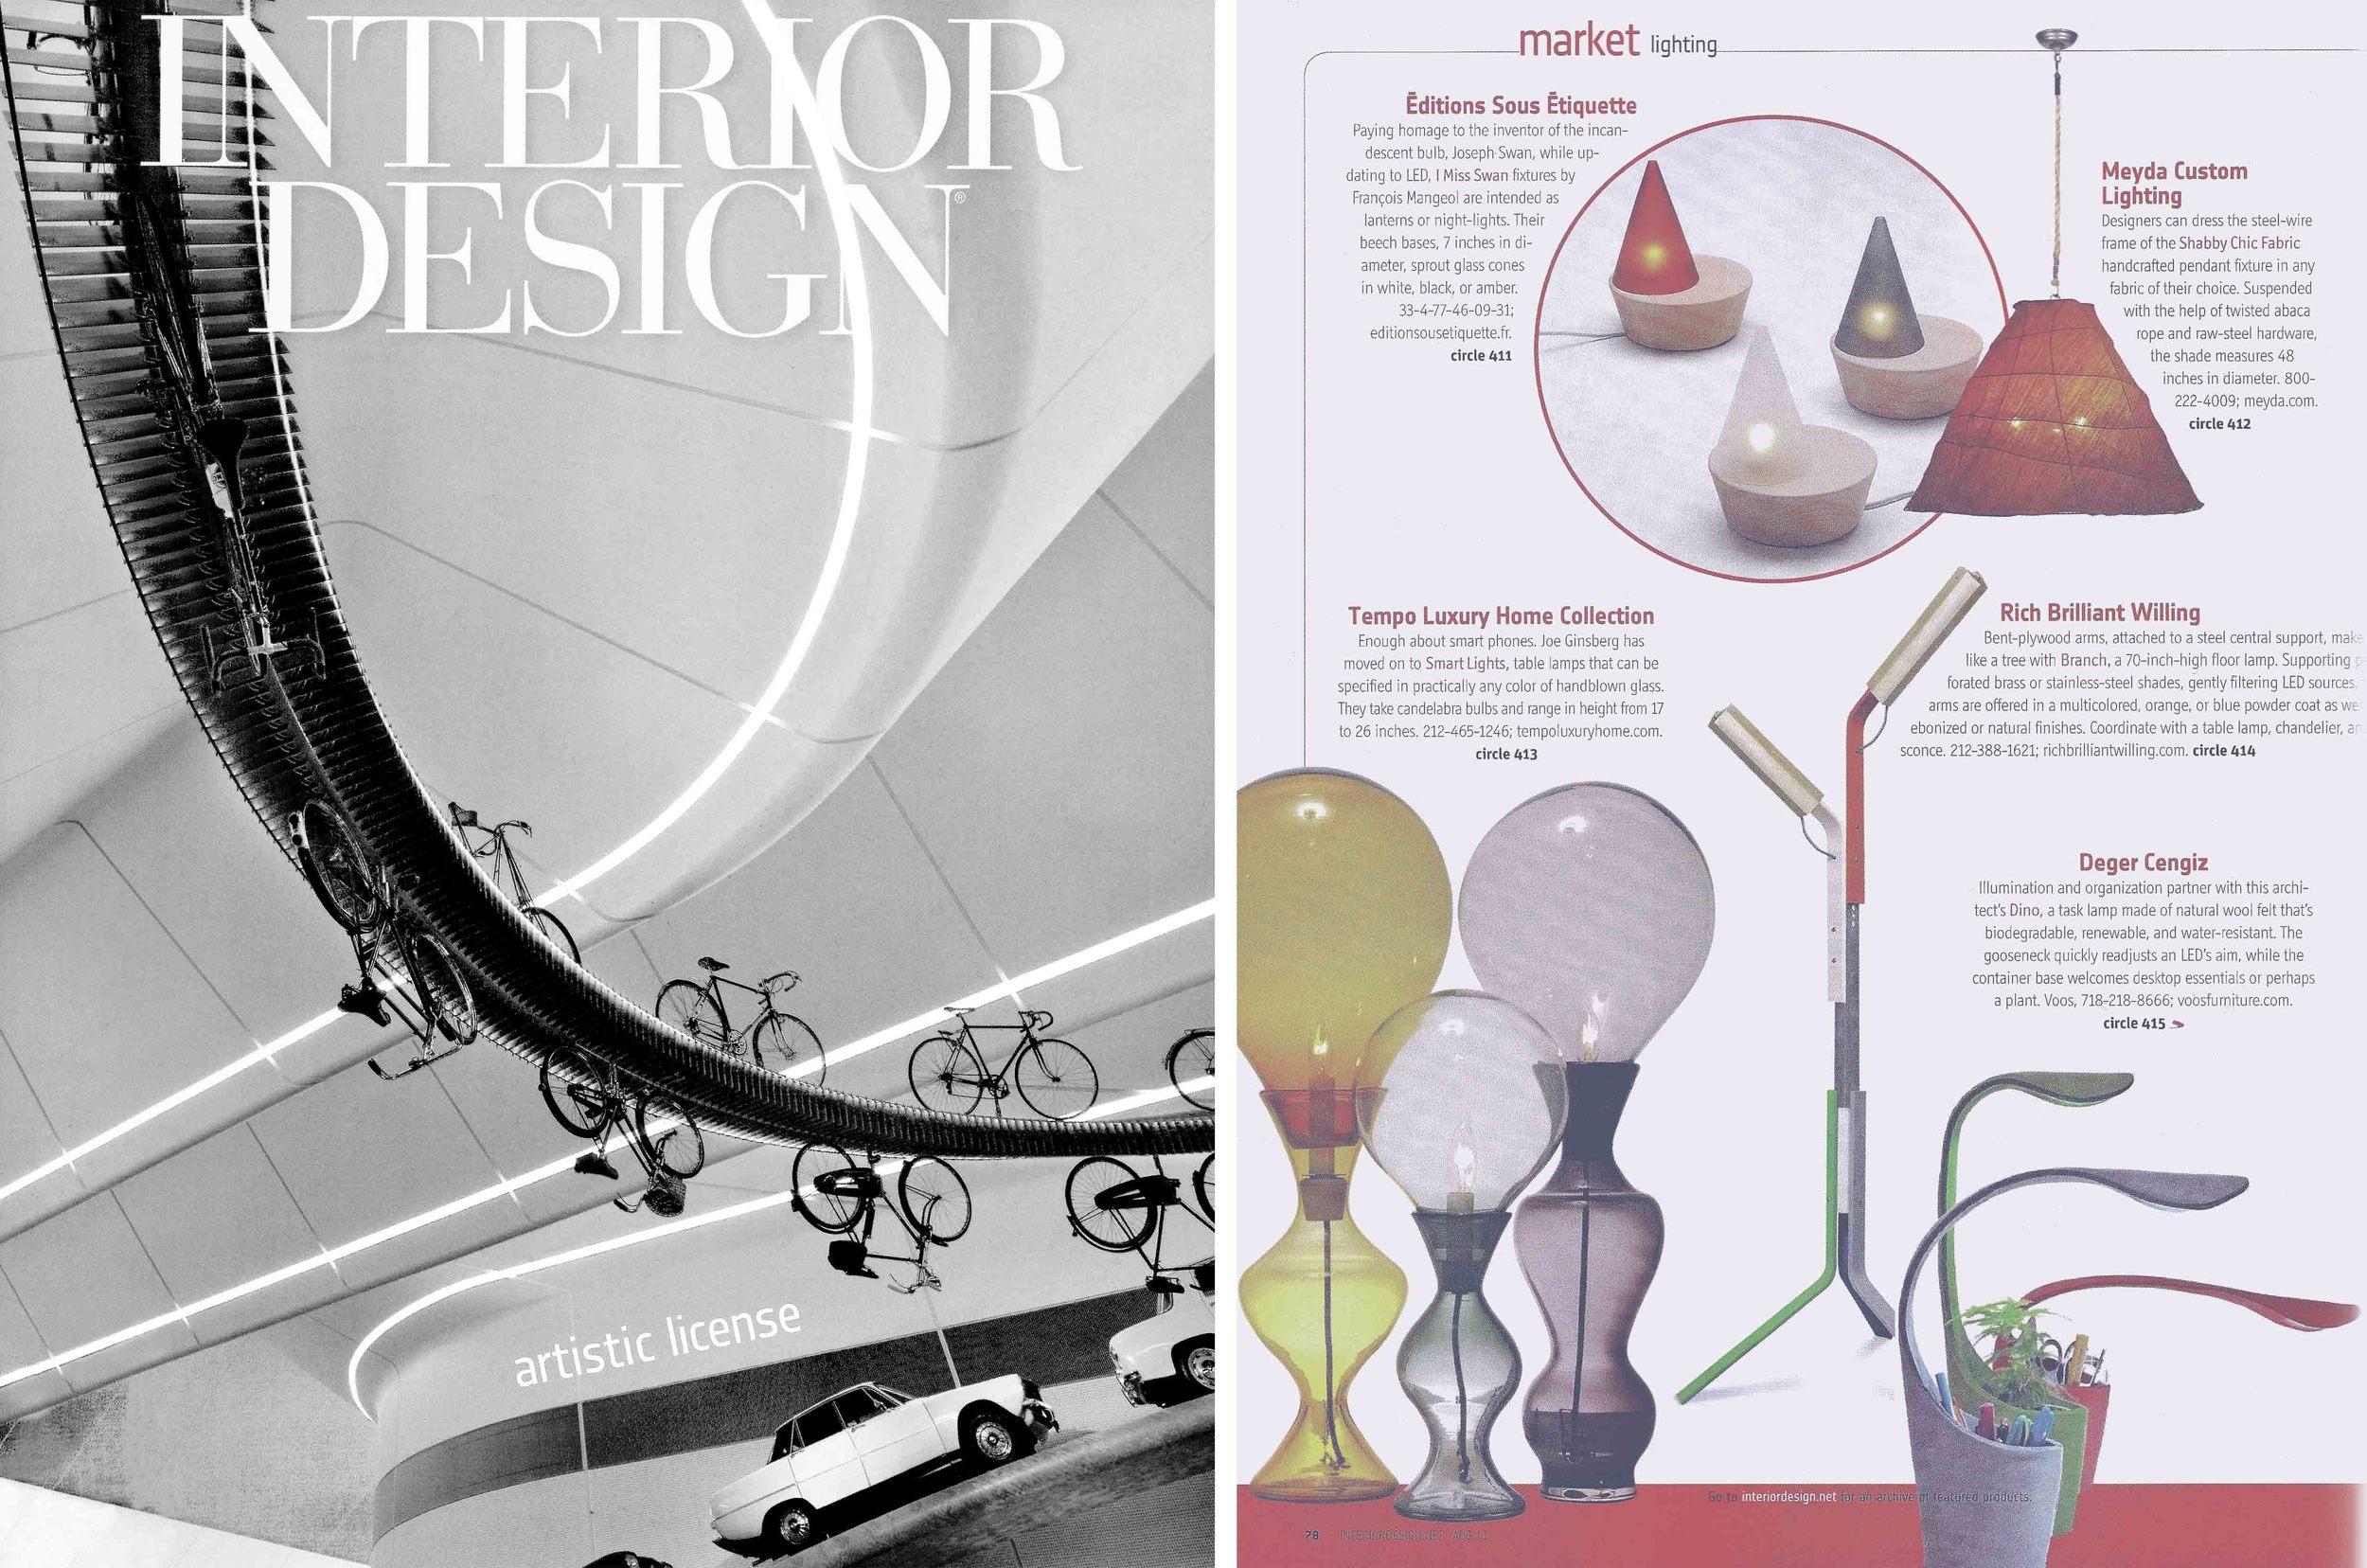 Interior designer serving the financial district, Manhattan, NY 10007 | Joe Ginsberg Design